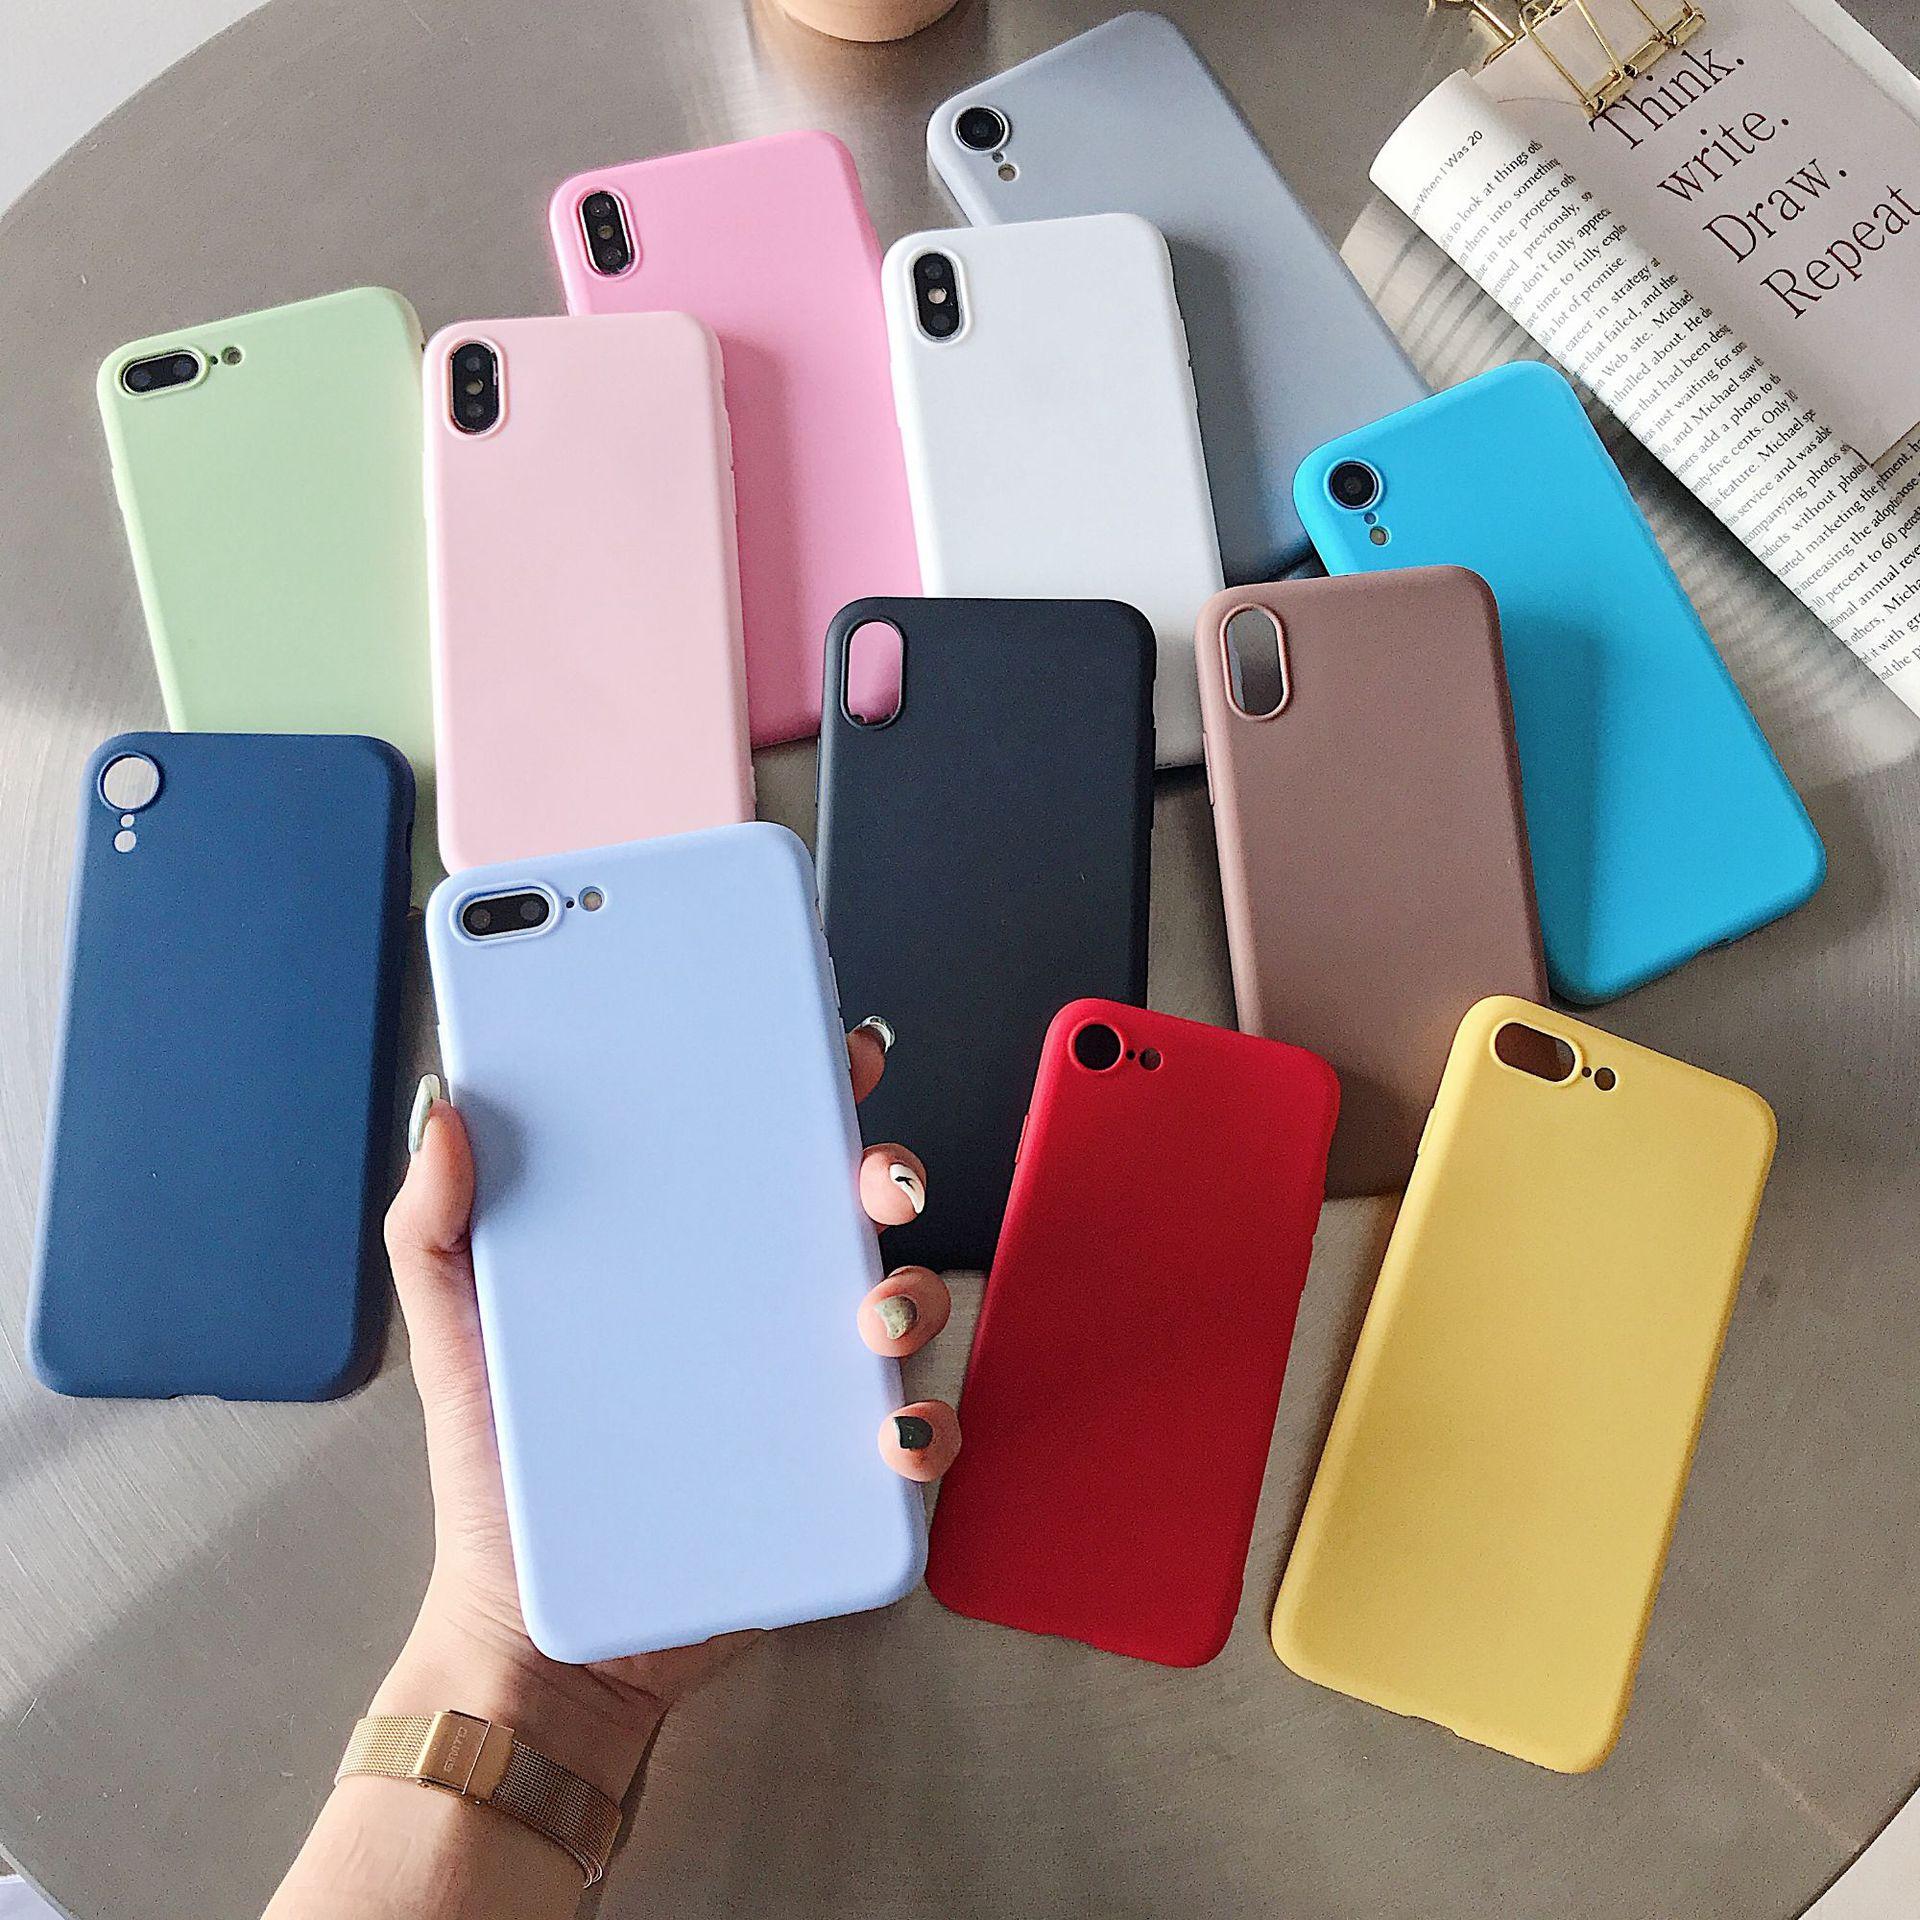 Silicone-Case Matte-Cover J2-Core Samsung Galaxy J510 J6 Prime For J3 J310 J7 J730/j5-Pro